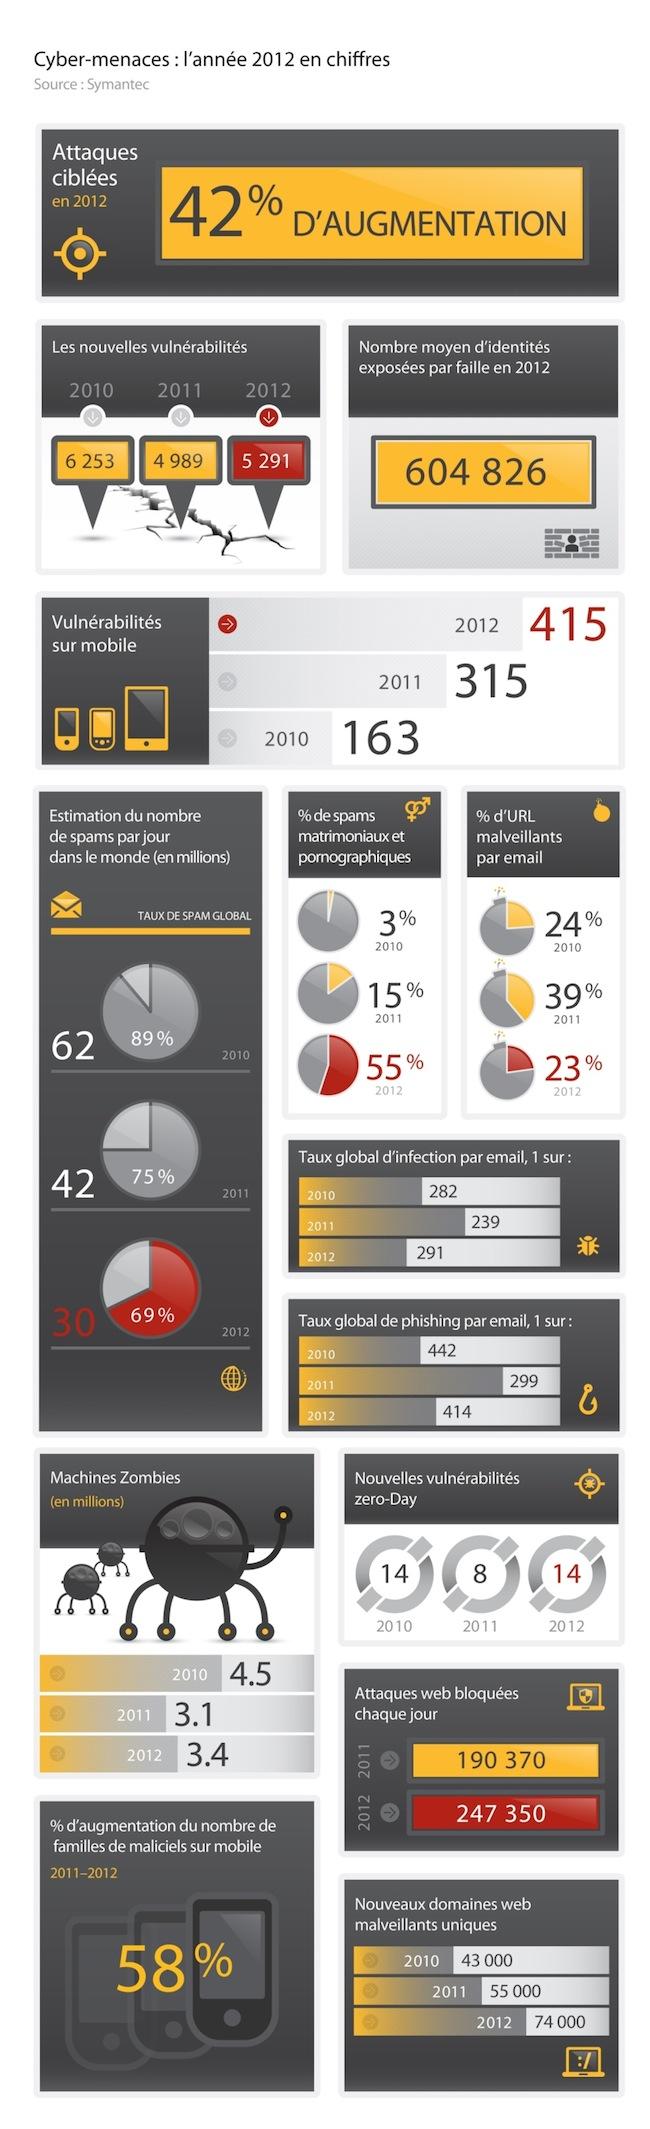 Symantec_frenchWeb_Infographie_ISTR_2012 en chiffres_WEB